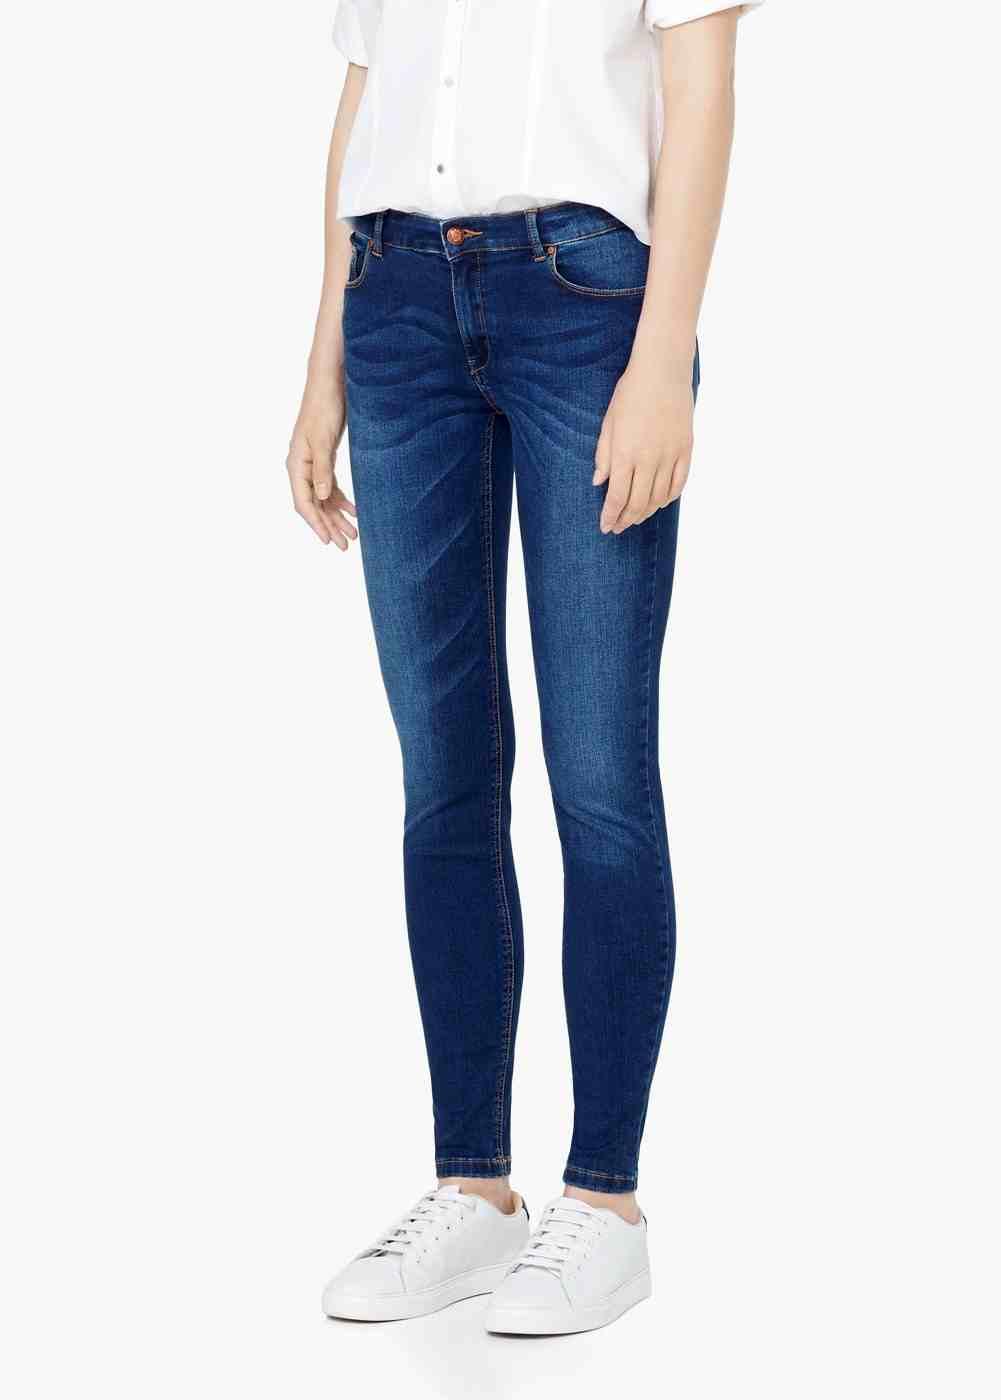 Mango - jeans (40€)